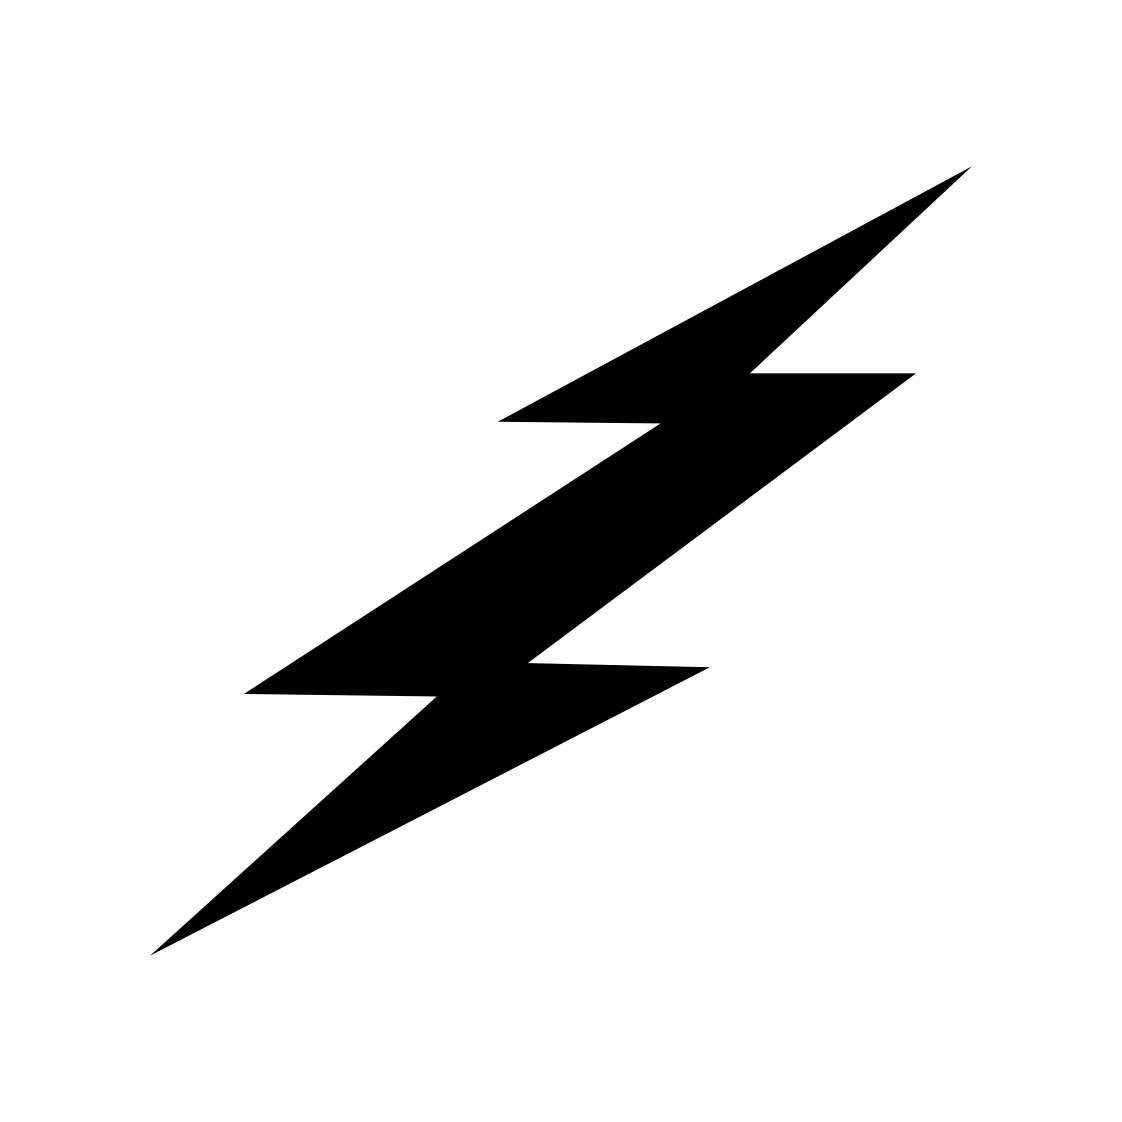 Harry Potter Lightning Bolt Magic Graphics Svg Dxf Eps Png Cdr Ai Pdf Vector Art Clipart Insta Lightning Bolt Design Harry Potter Lightning Bolt Lightning Bolt